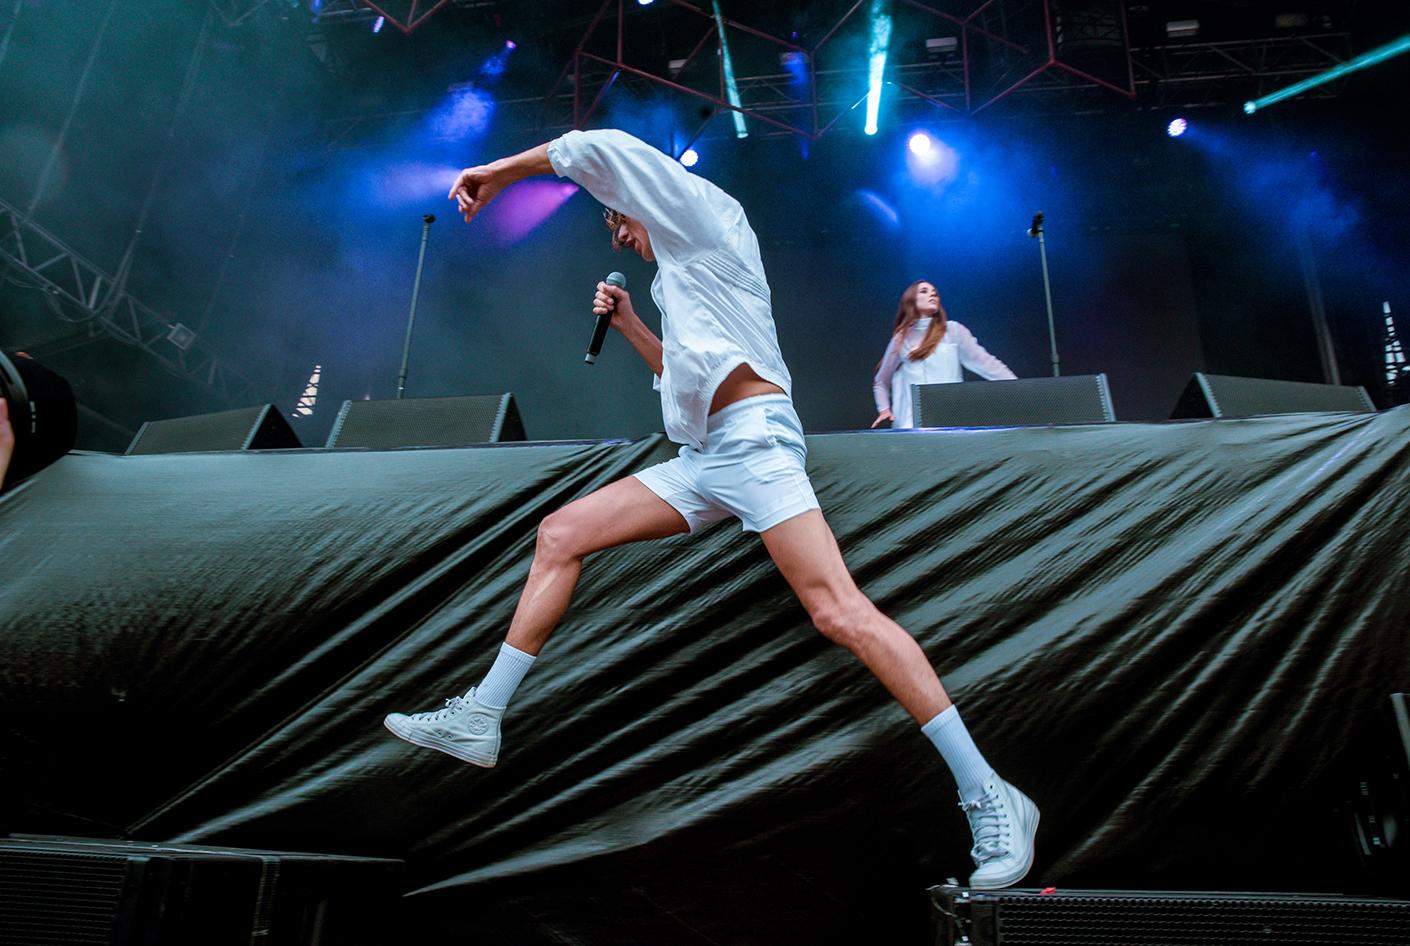 live review falls festival byron bay photo credit dominique berns blackwell savage thrills savagethrills 1